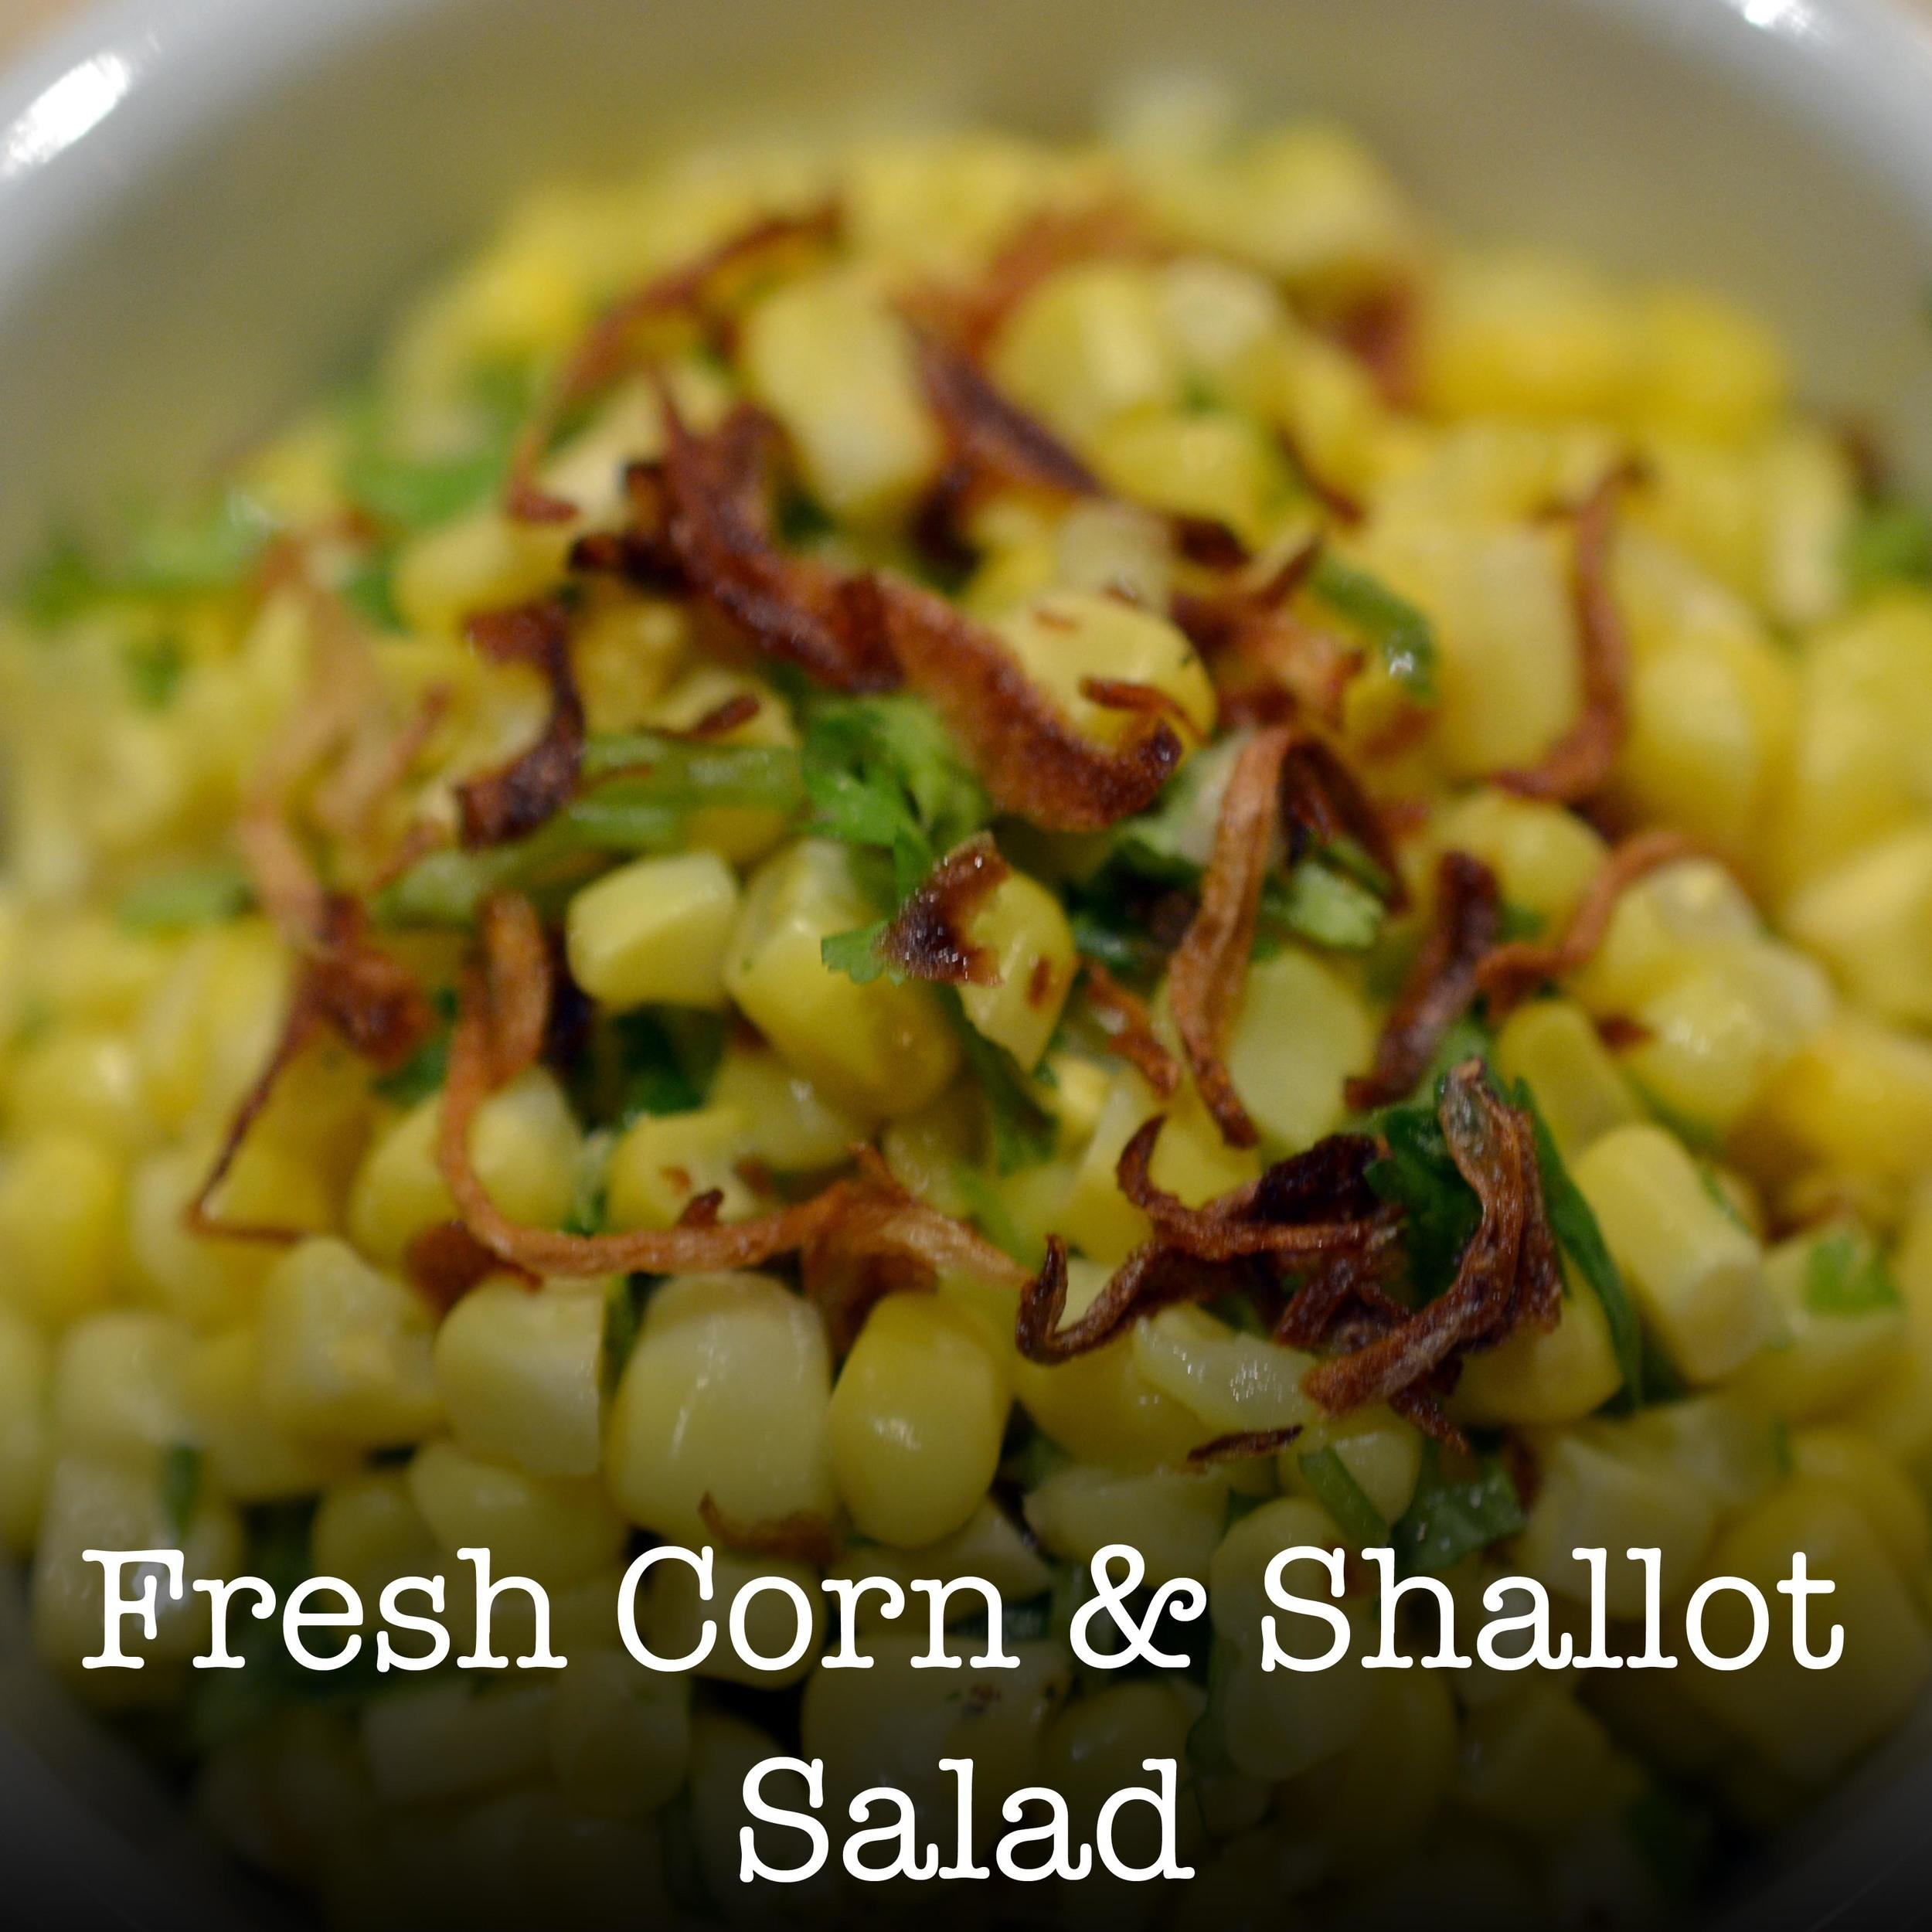 Fresh Corn & Shallot Salad.jpg